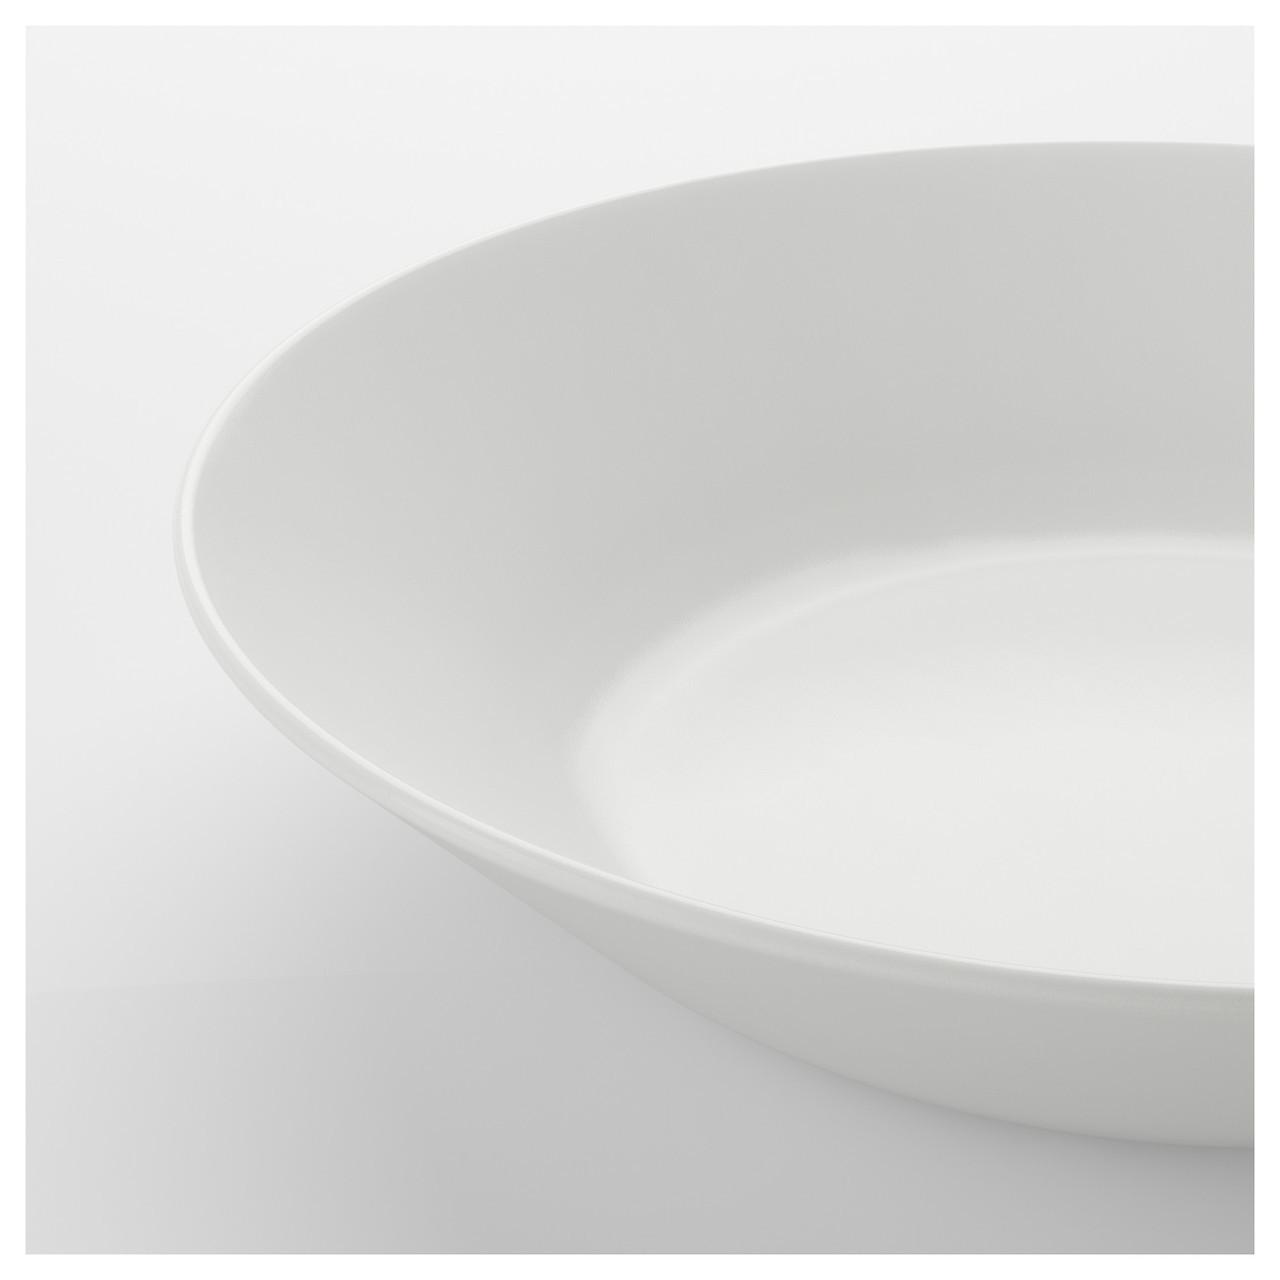 Глубокая тарелка OFTAST Ø 20